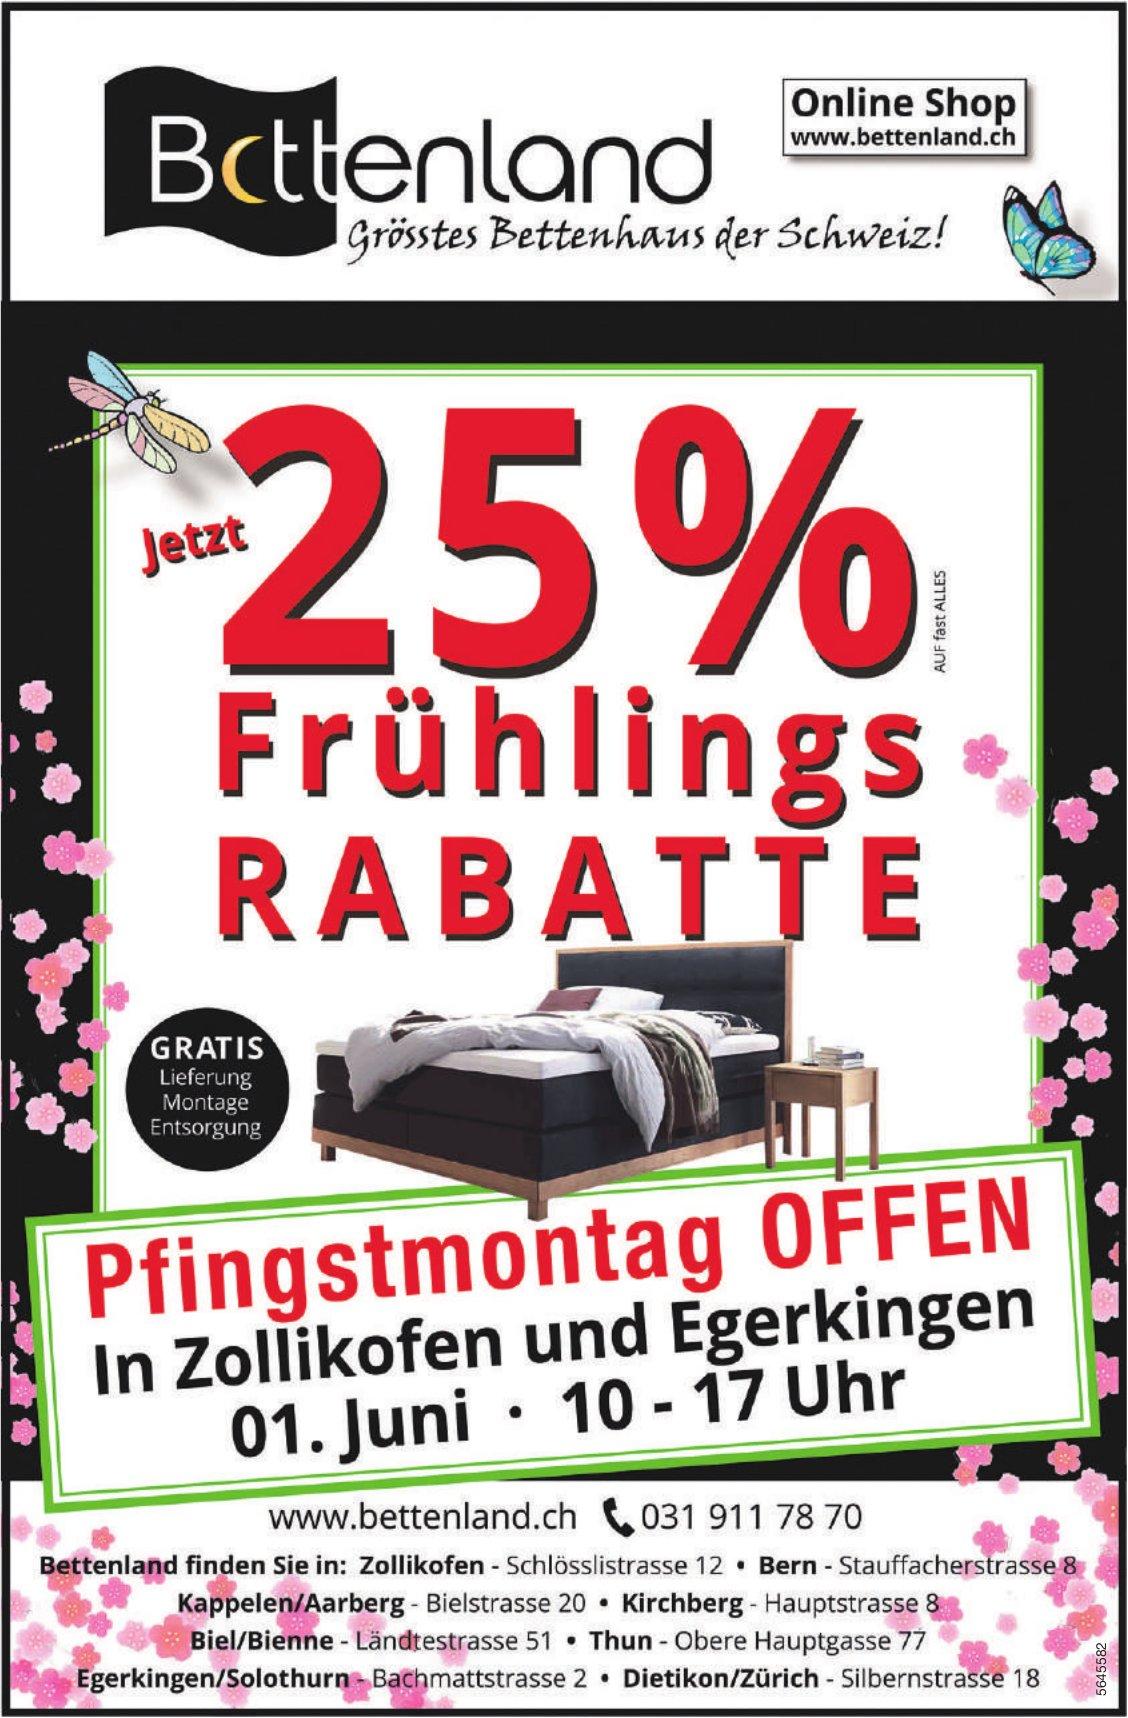 Jetzt 25% Frühlings RABATTE, Bettenland